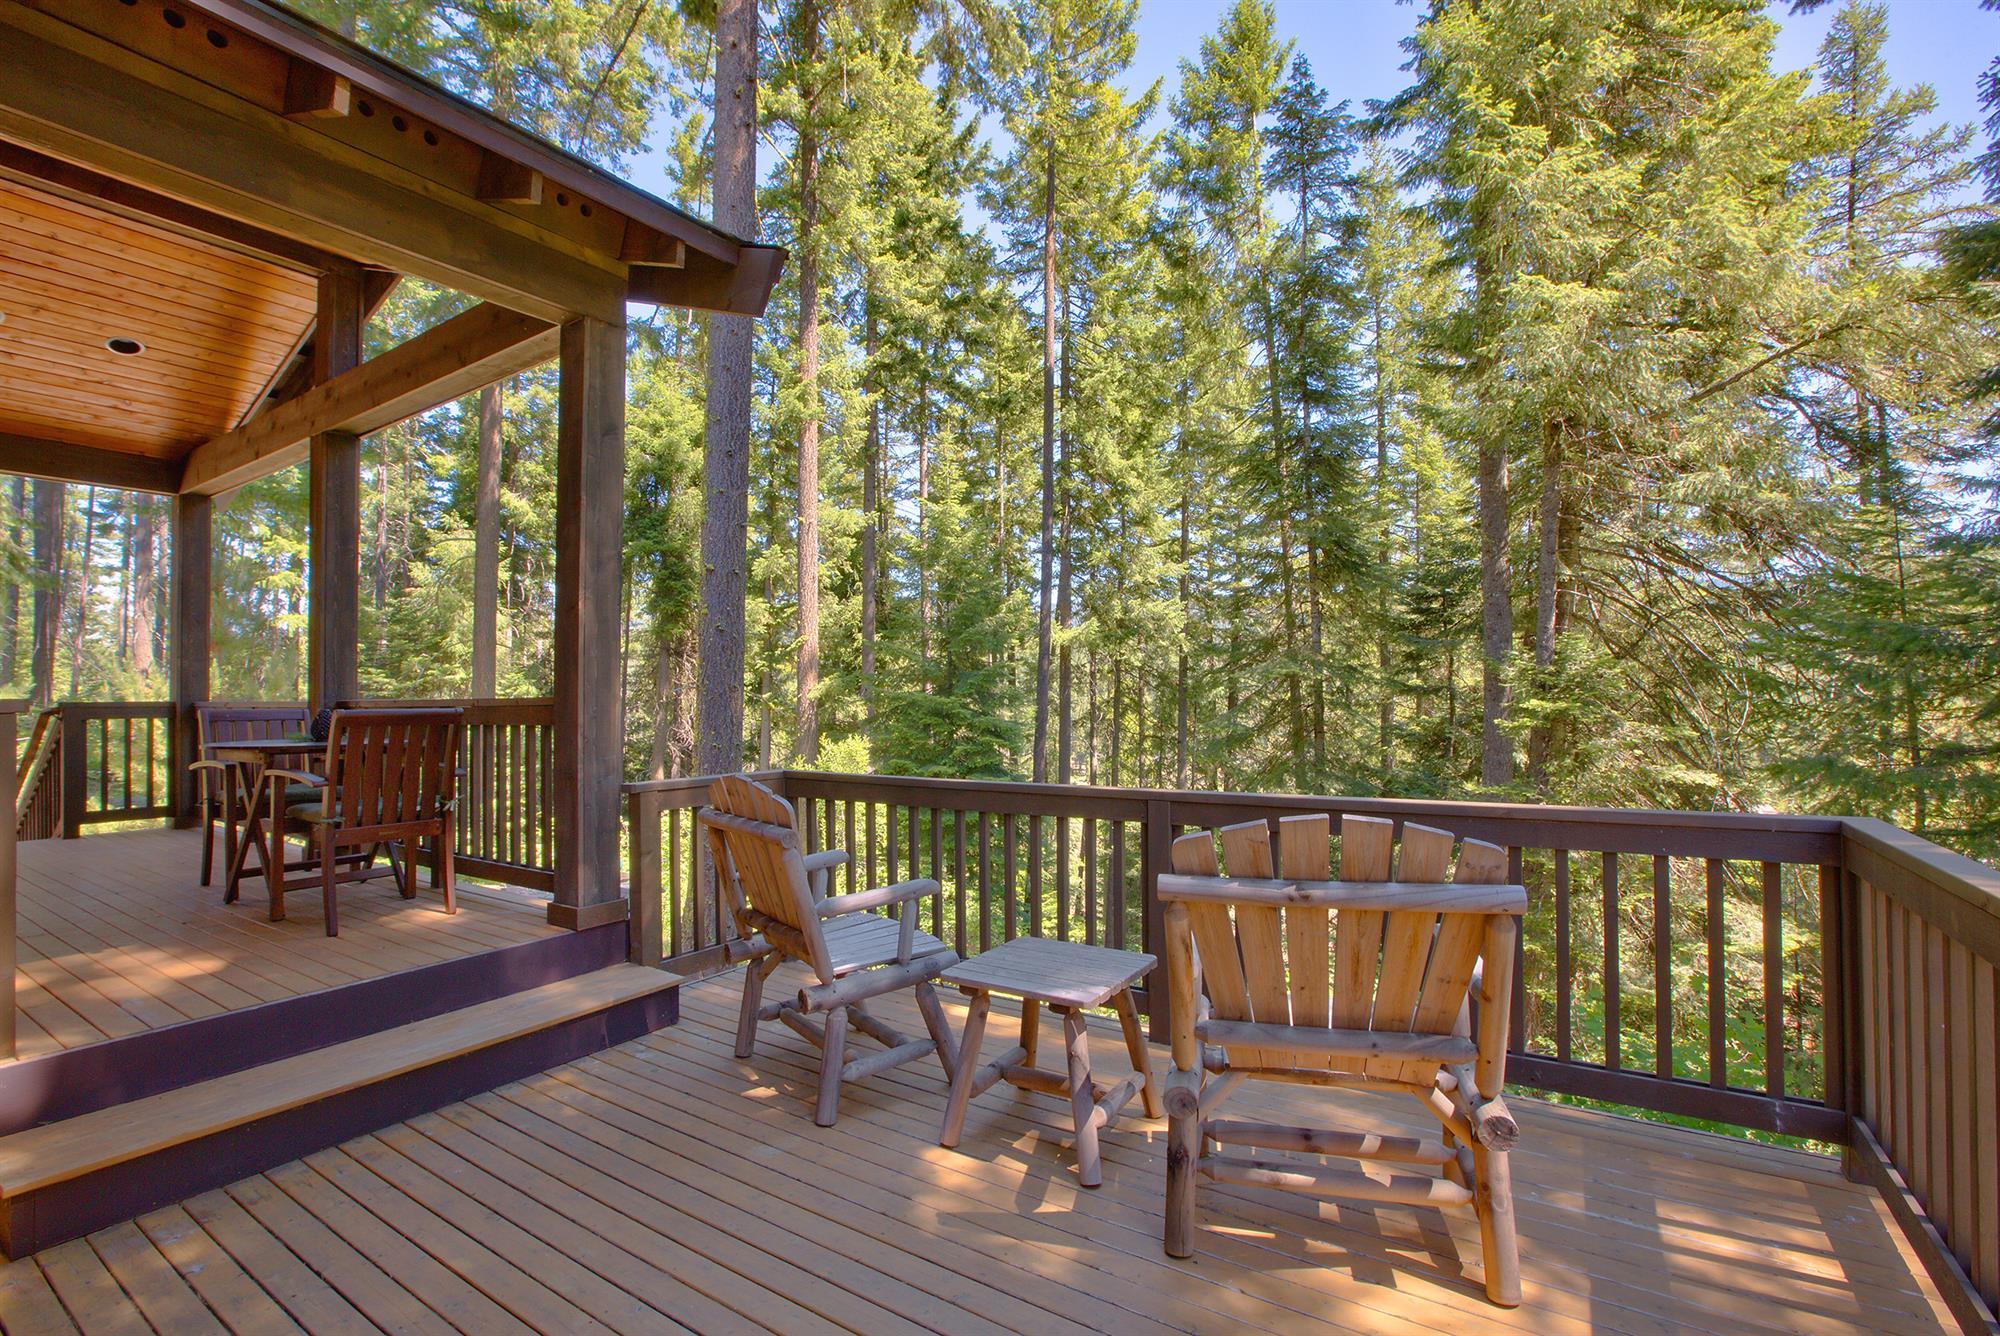 Treetop Deck